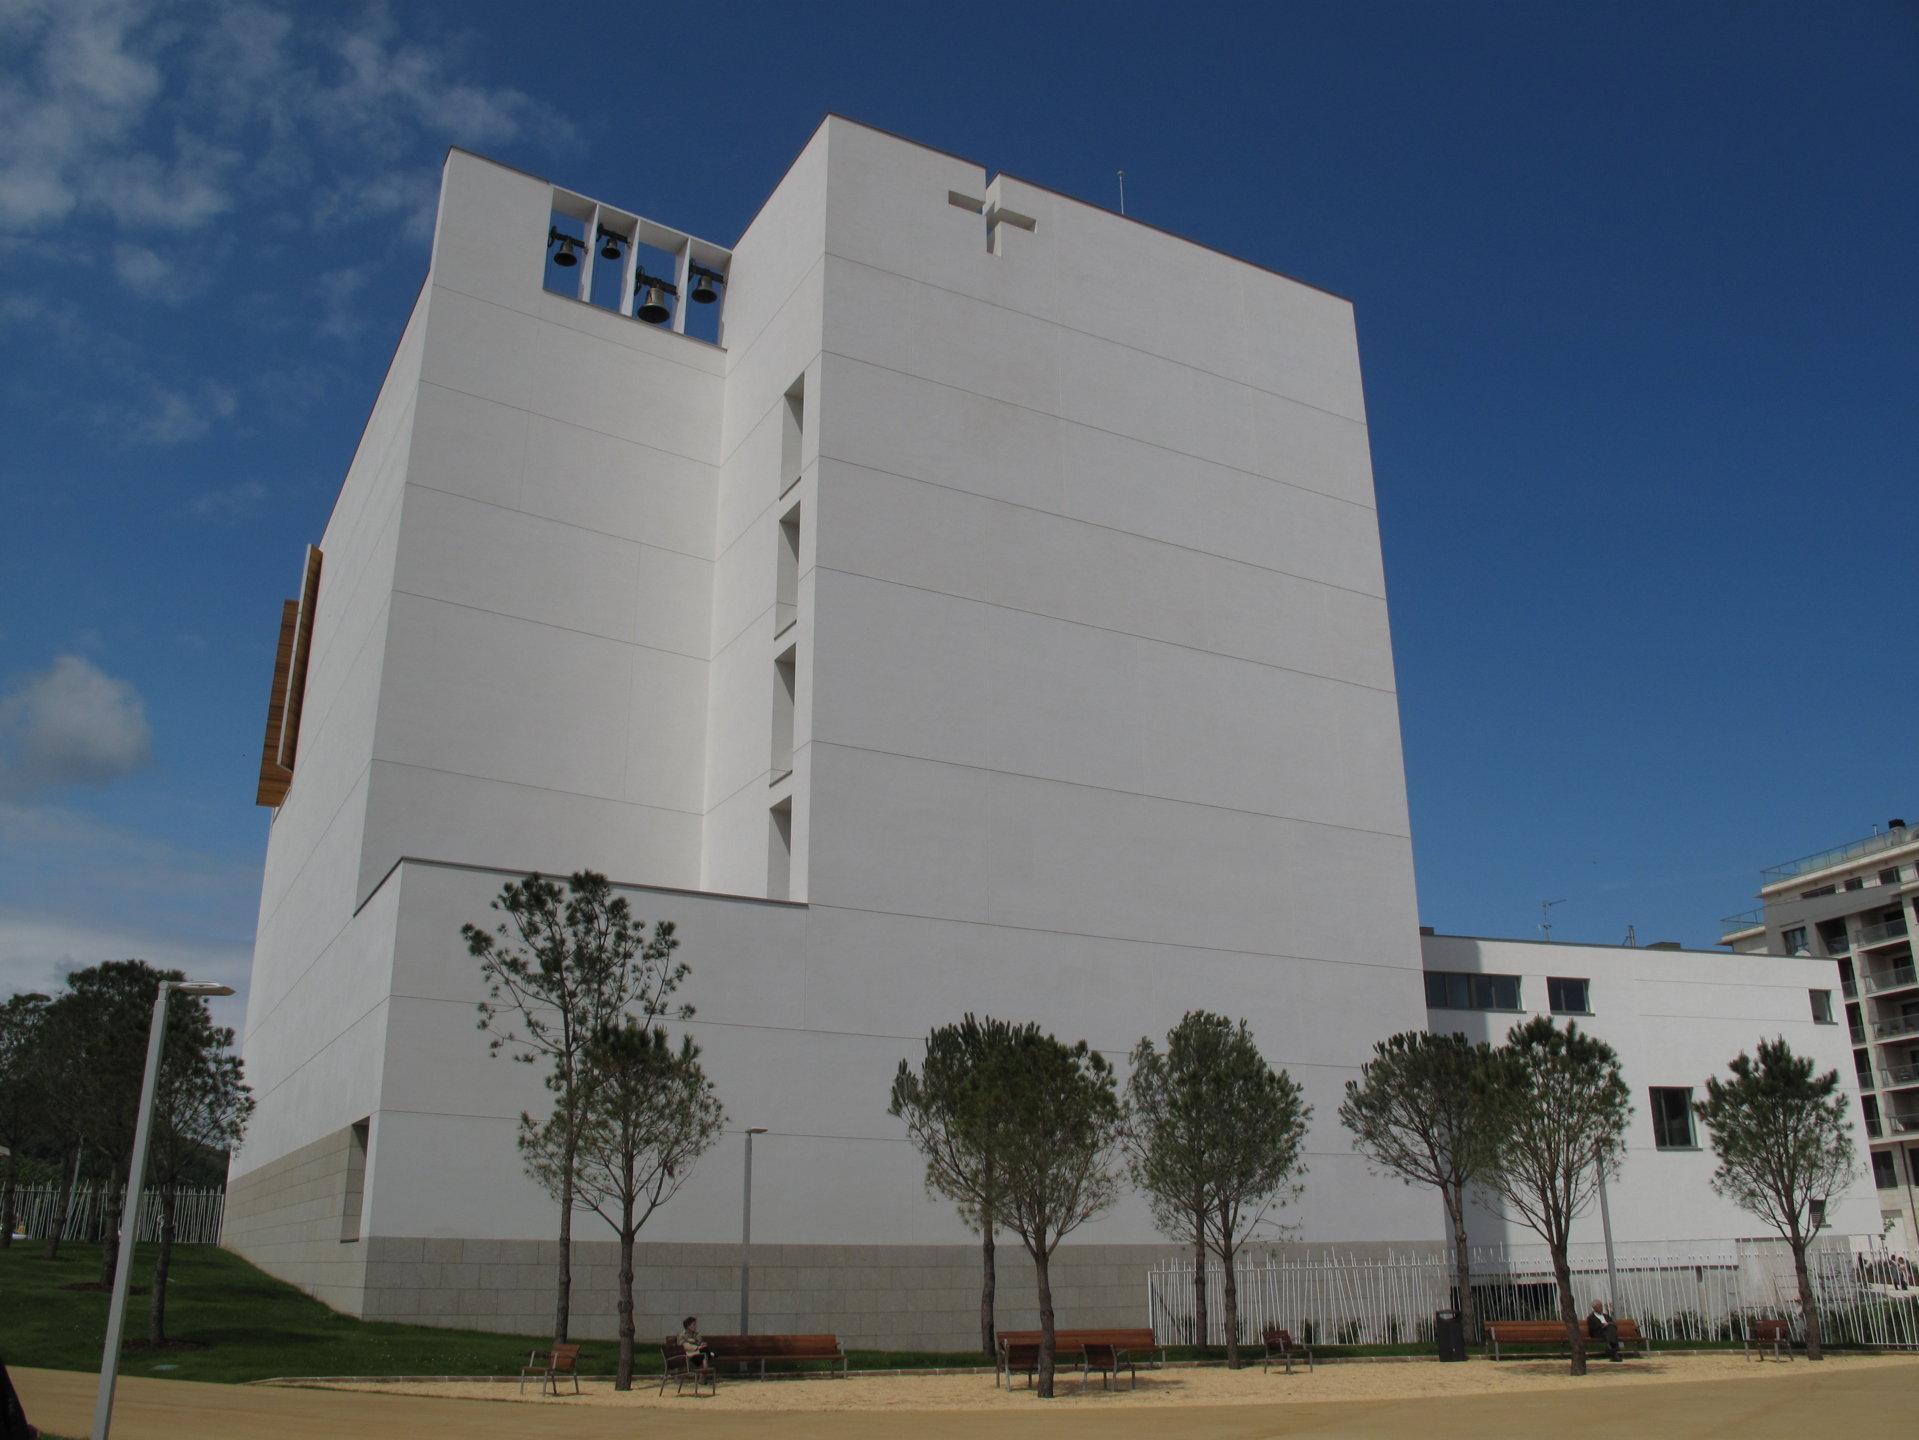 iglesia_de_iesu-donostia-r-_moneo-fileminimizer